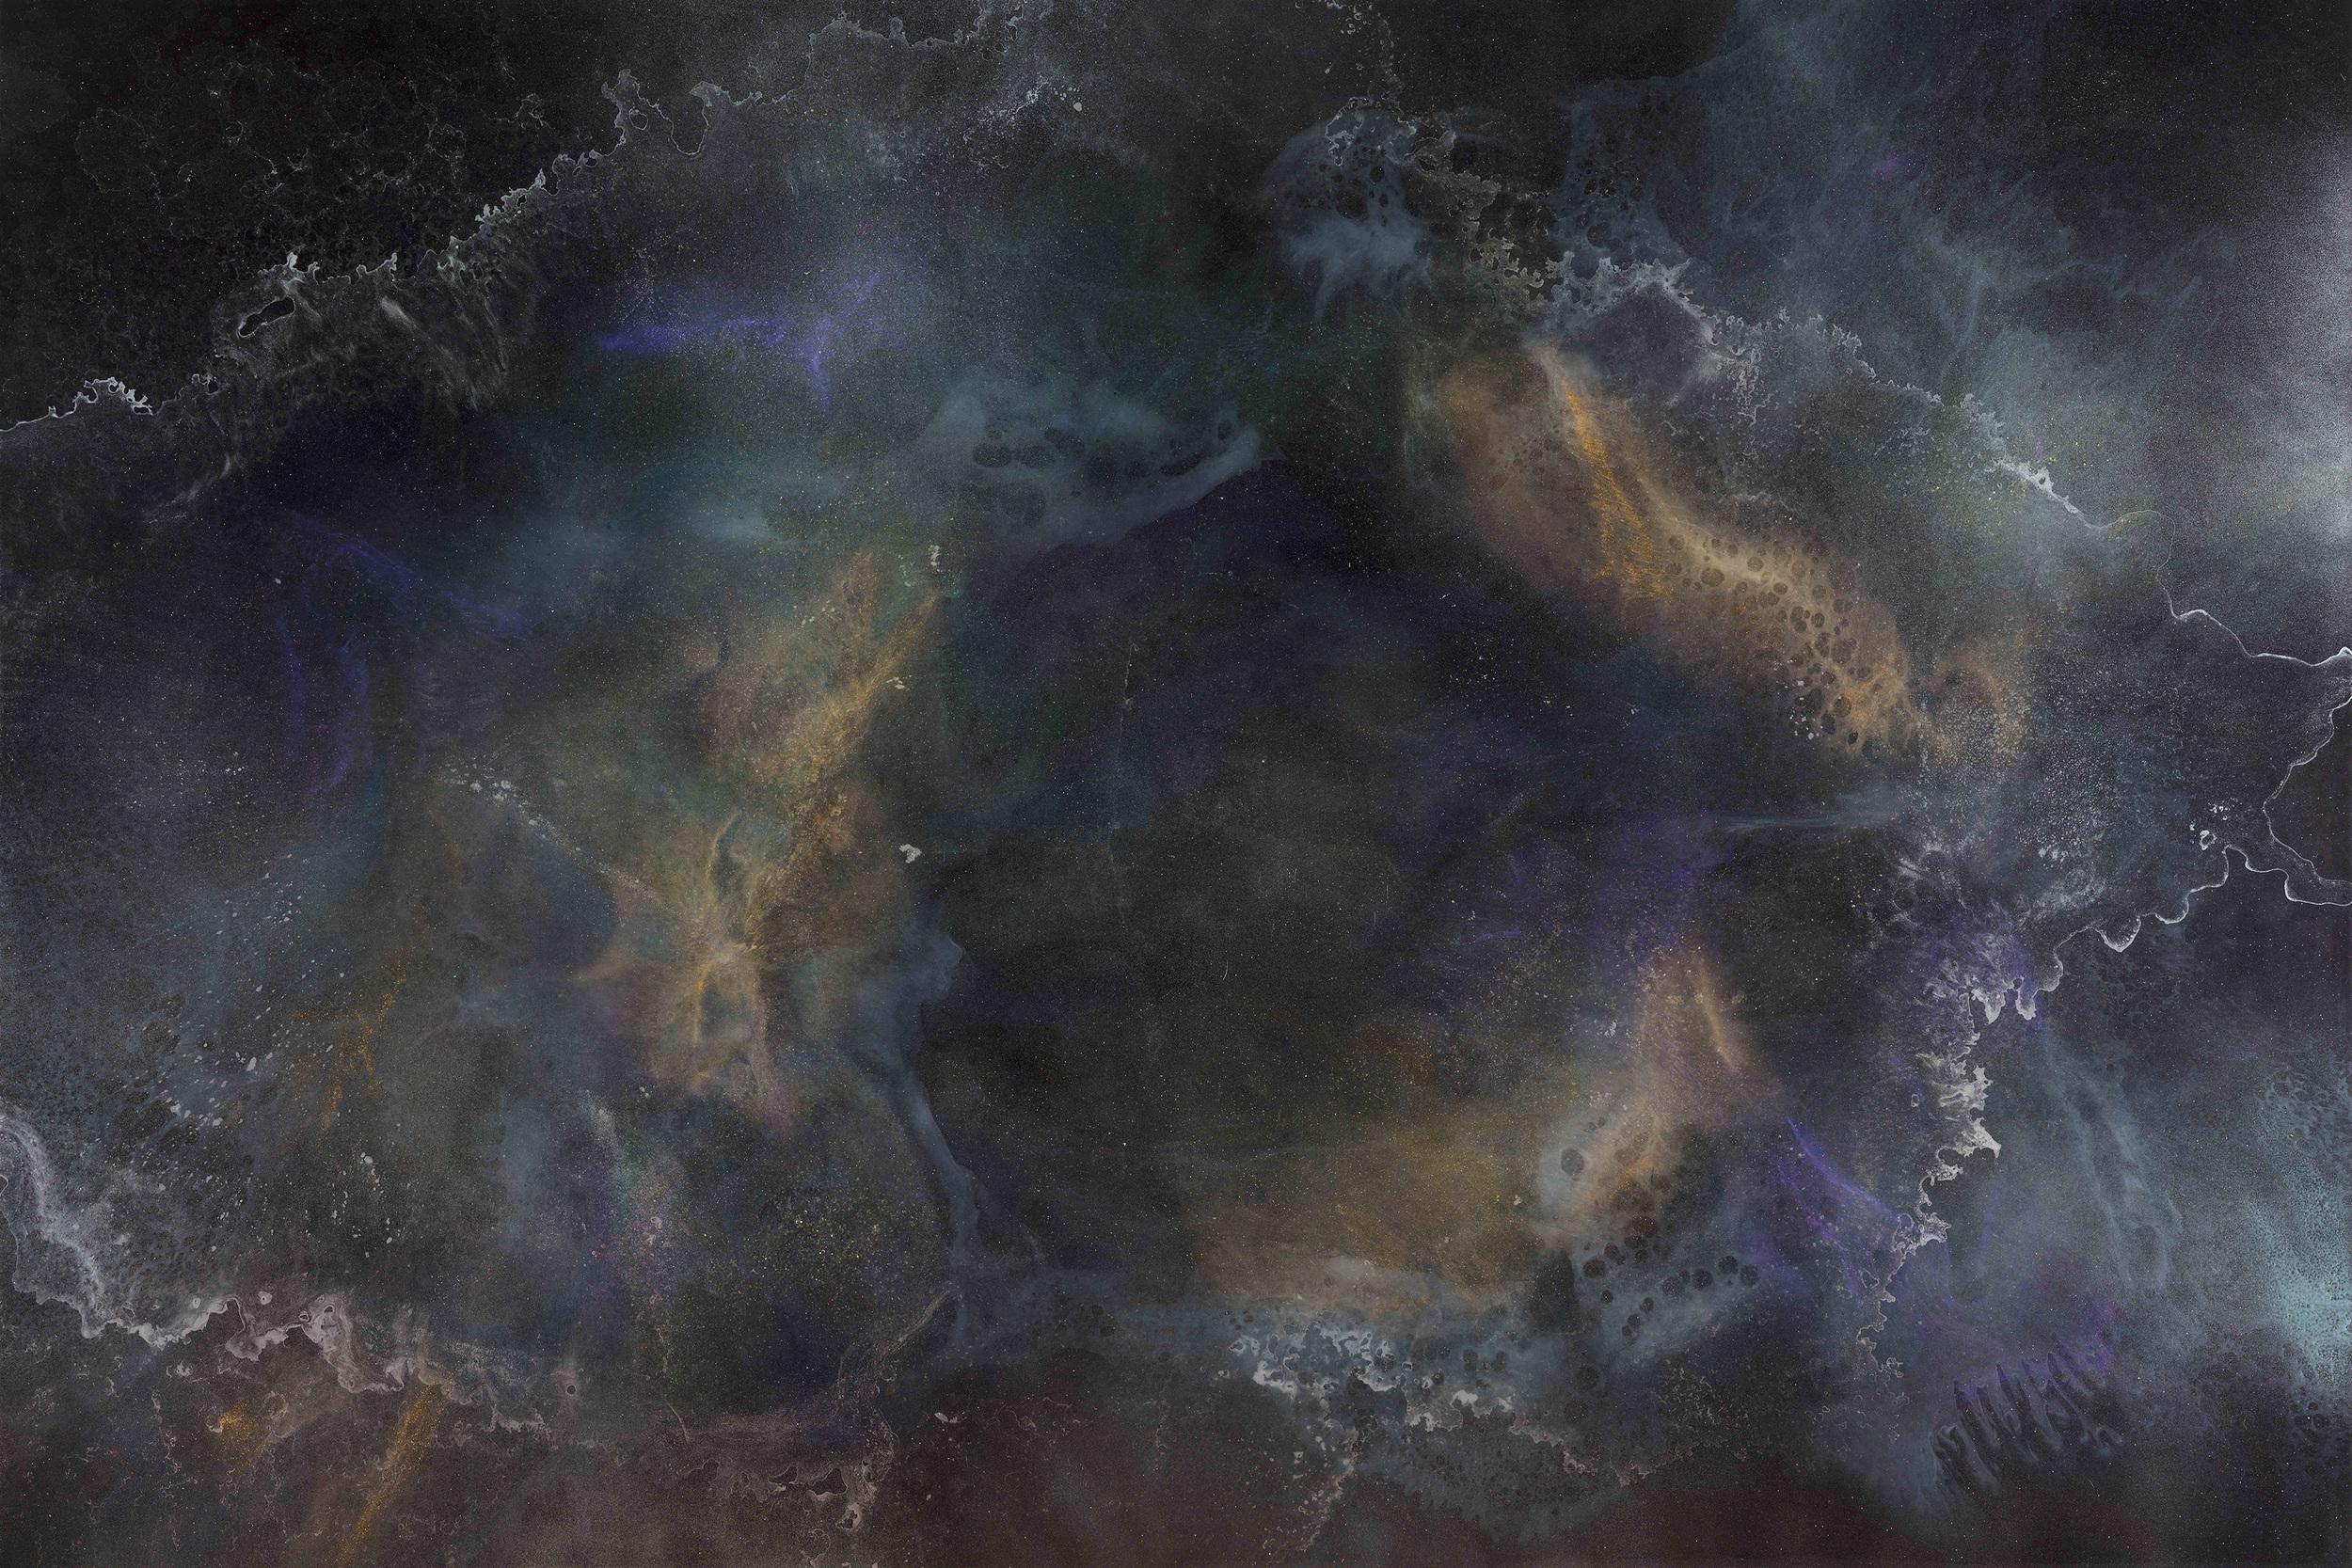 'Midnight' click here for full artwork details.